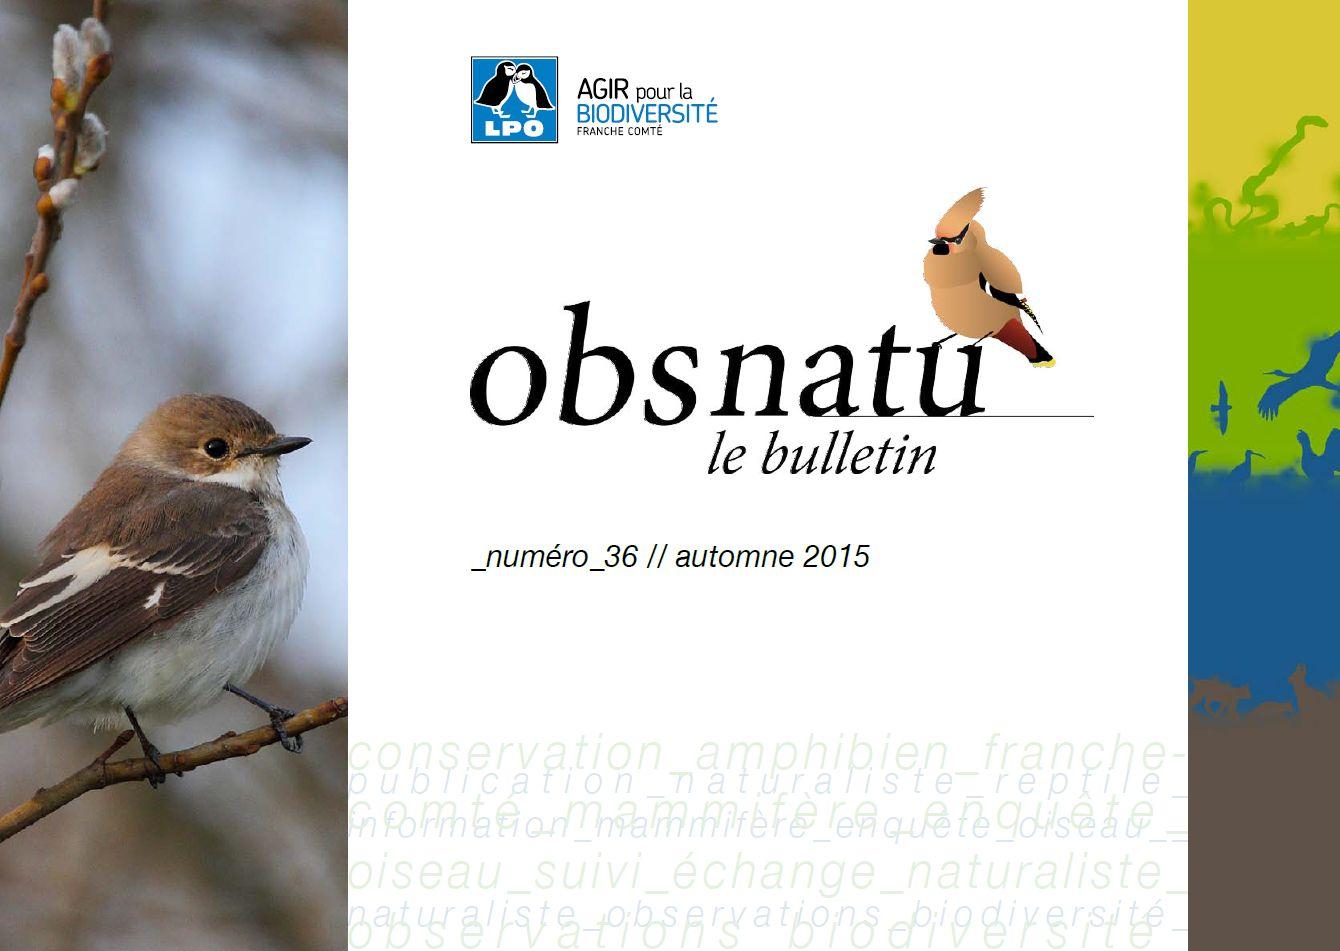 https://cdnfiles1.biolovision.net/franche-comte.lpo.fr/userfiles/publications/Obsnatubulls/Obsnatun36automne2015couv.jpg